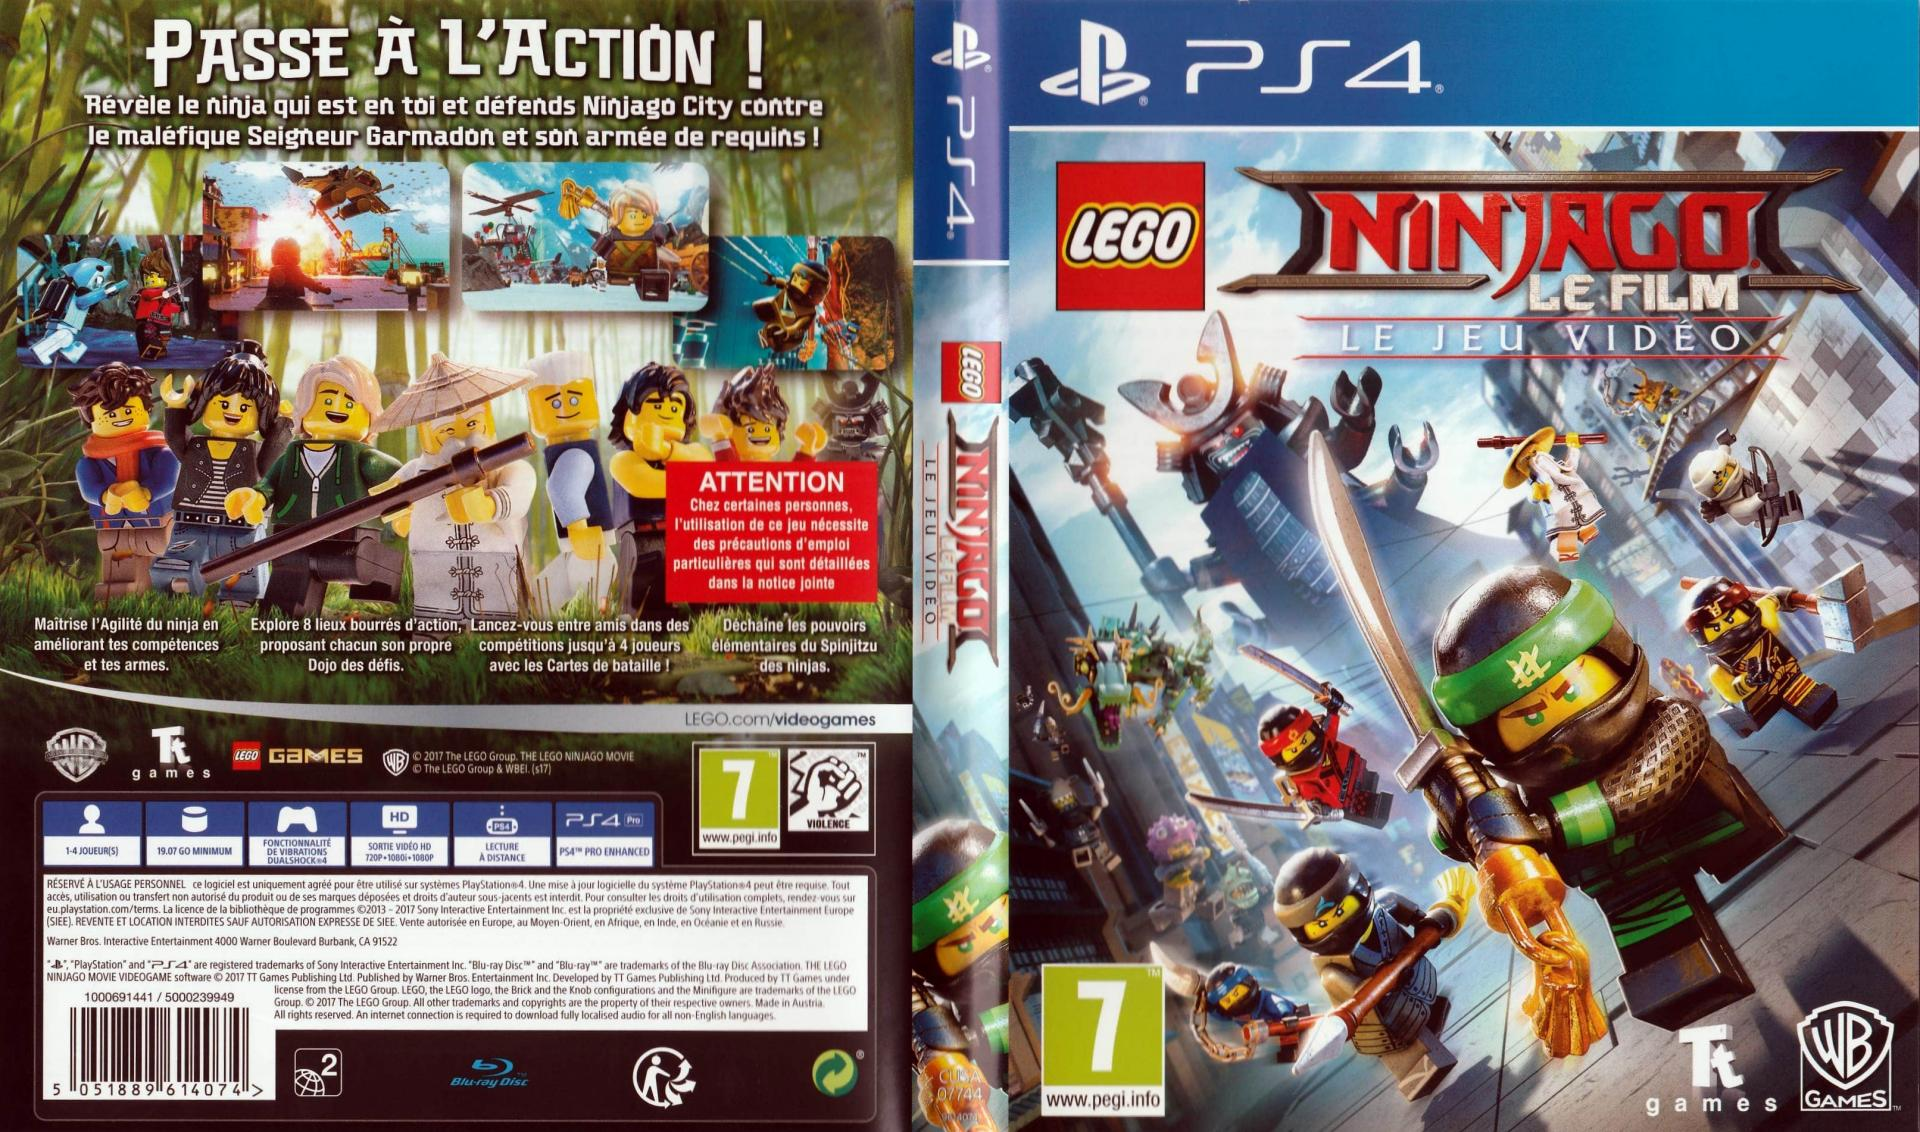 jaquette lego ninjago imprimer telecharger gratuit fr